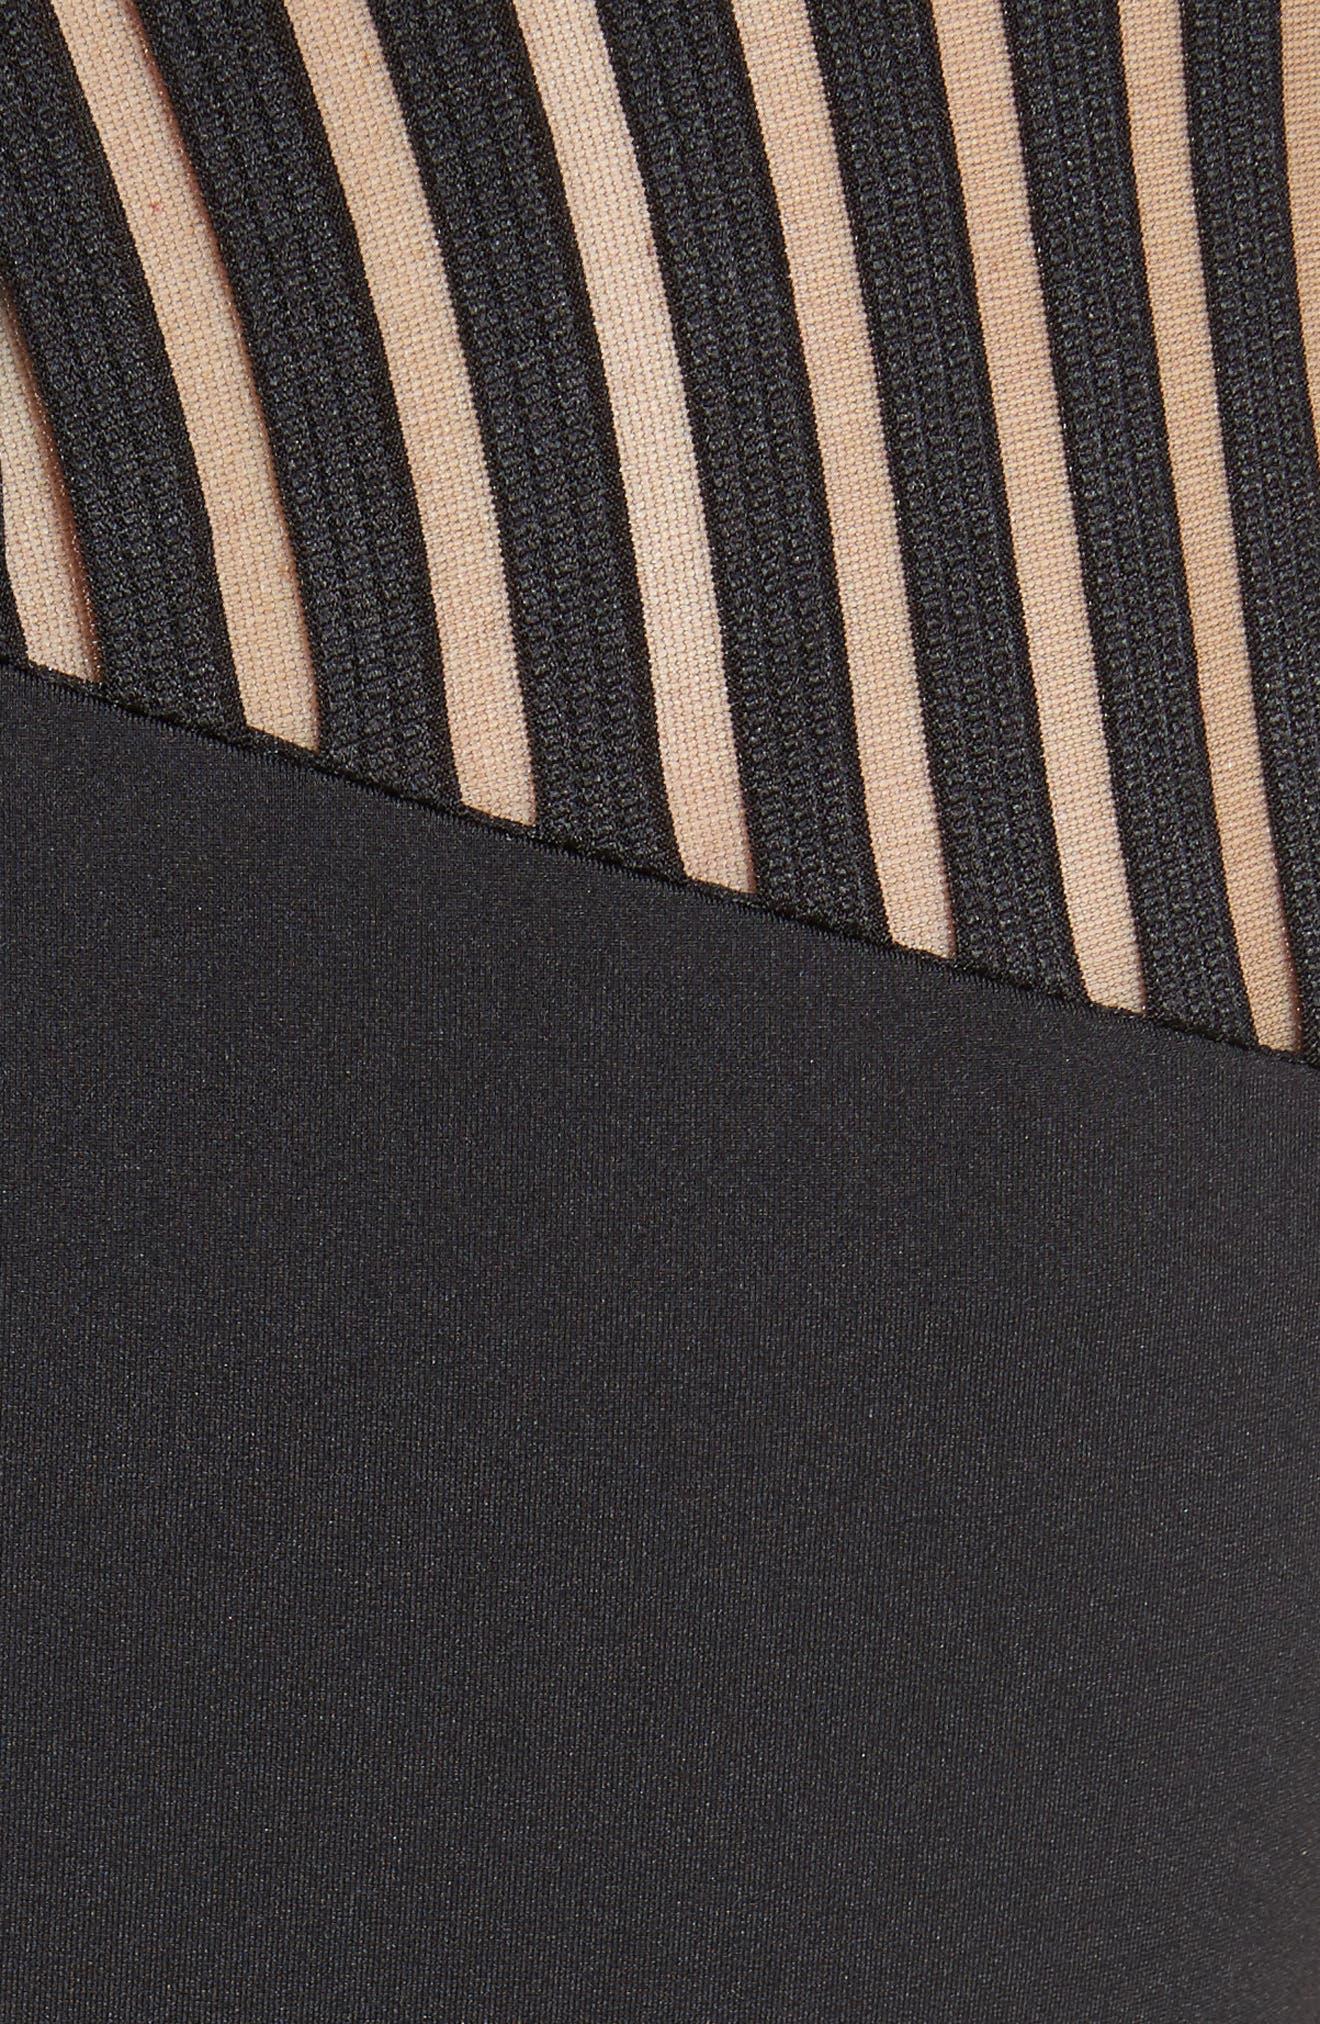 TED BAKER LONDON,                             Lucette Mesh Detail Body Con Dress,                             Alternate thumbnail 5, color,                             001